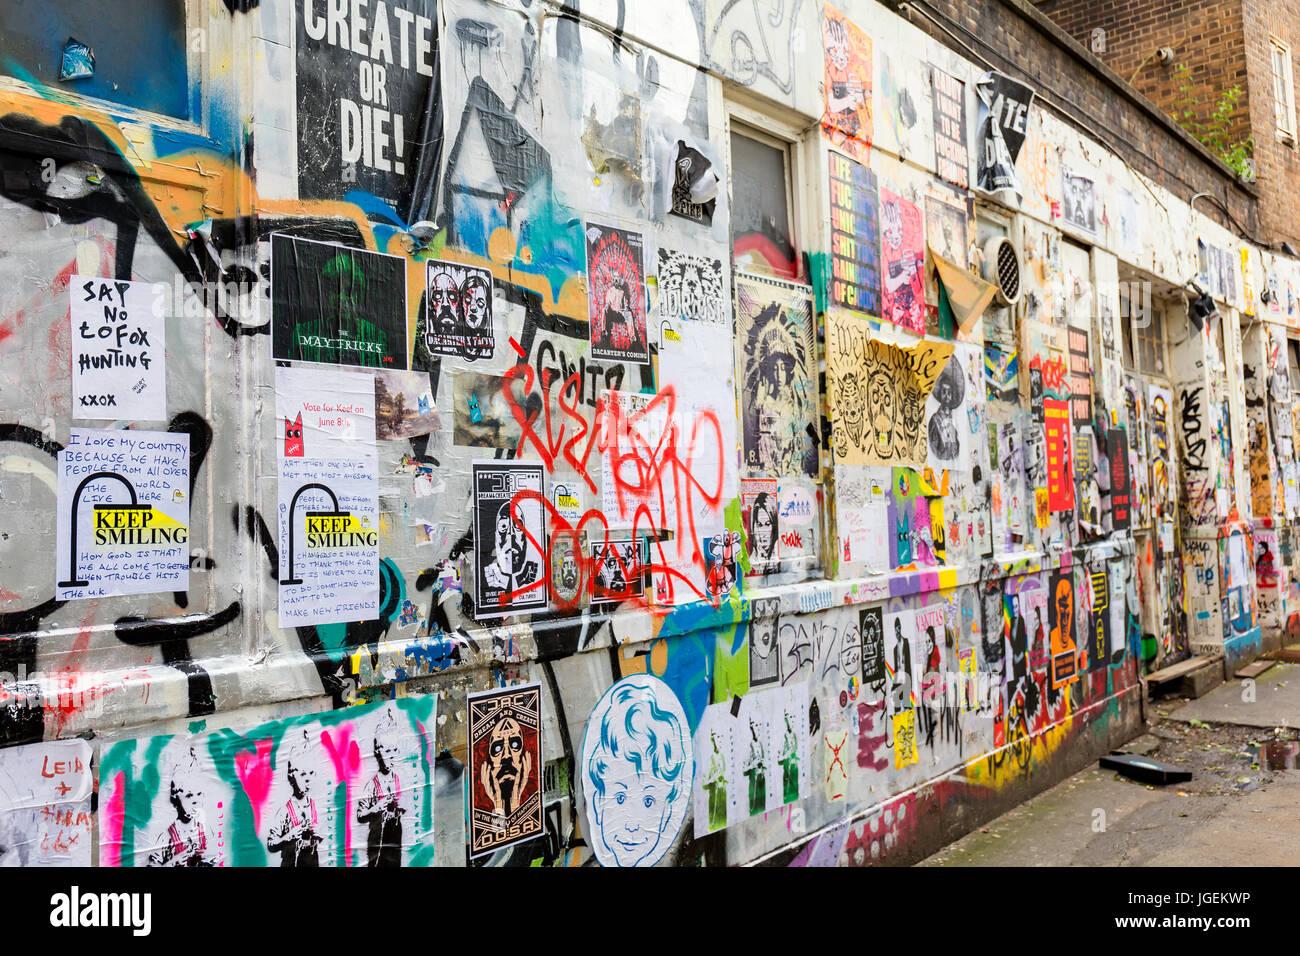 Graffiti wall near Brick Lane in Tower Hamlets London - Stock Image